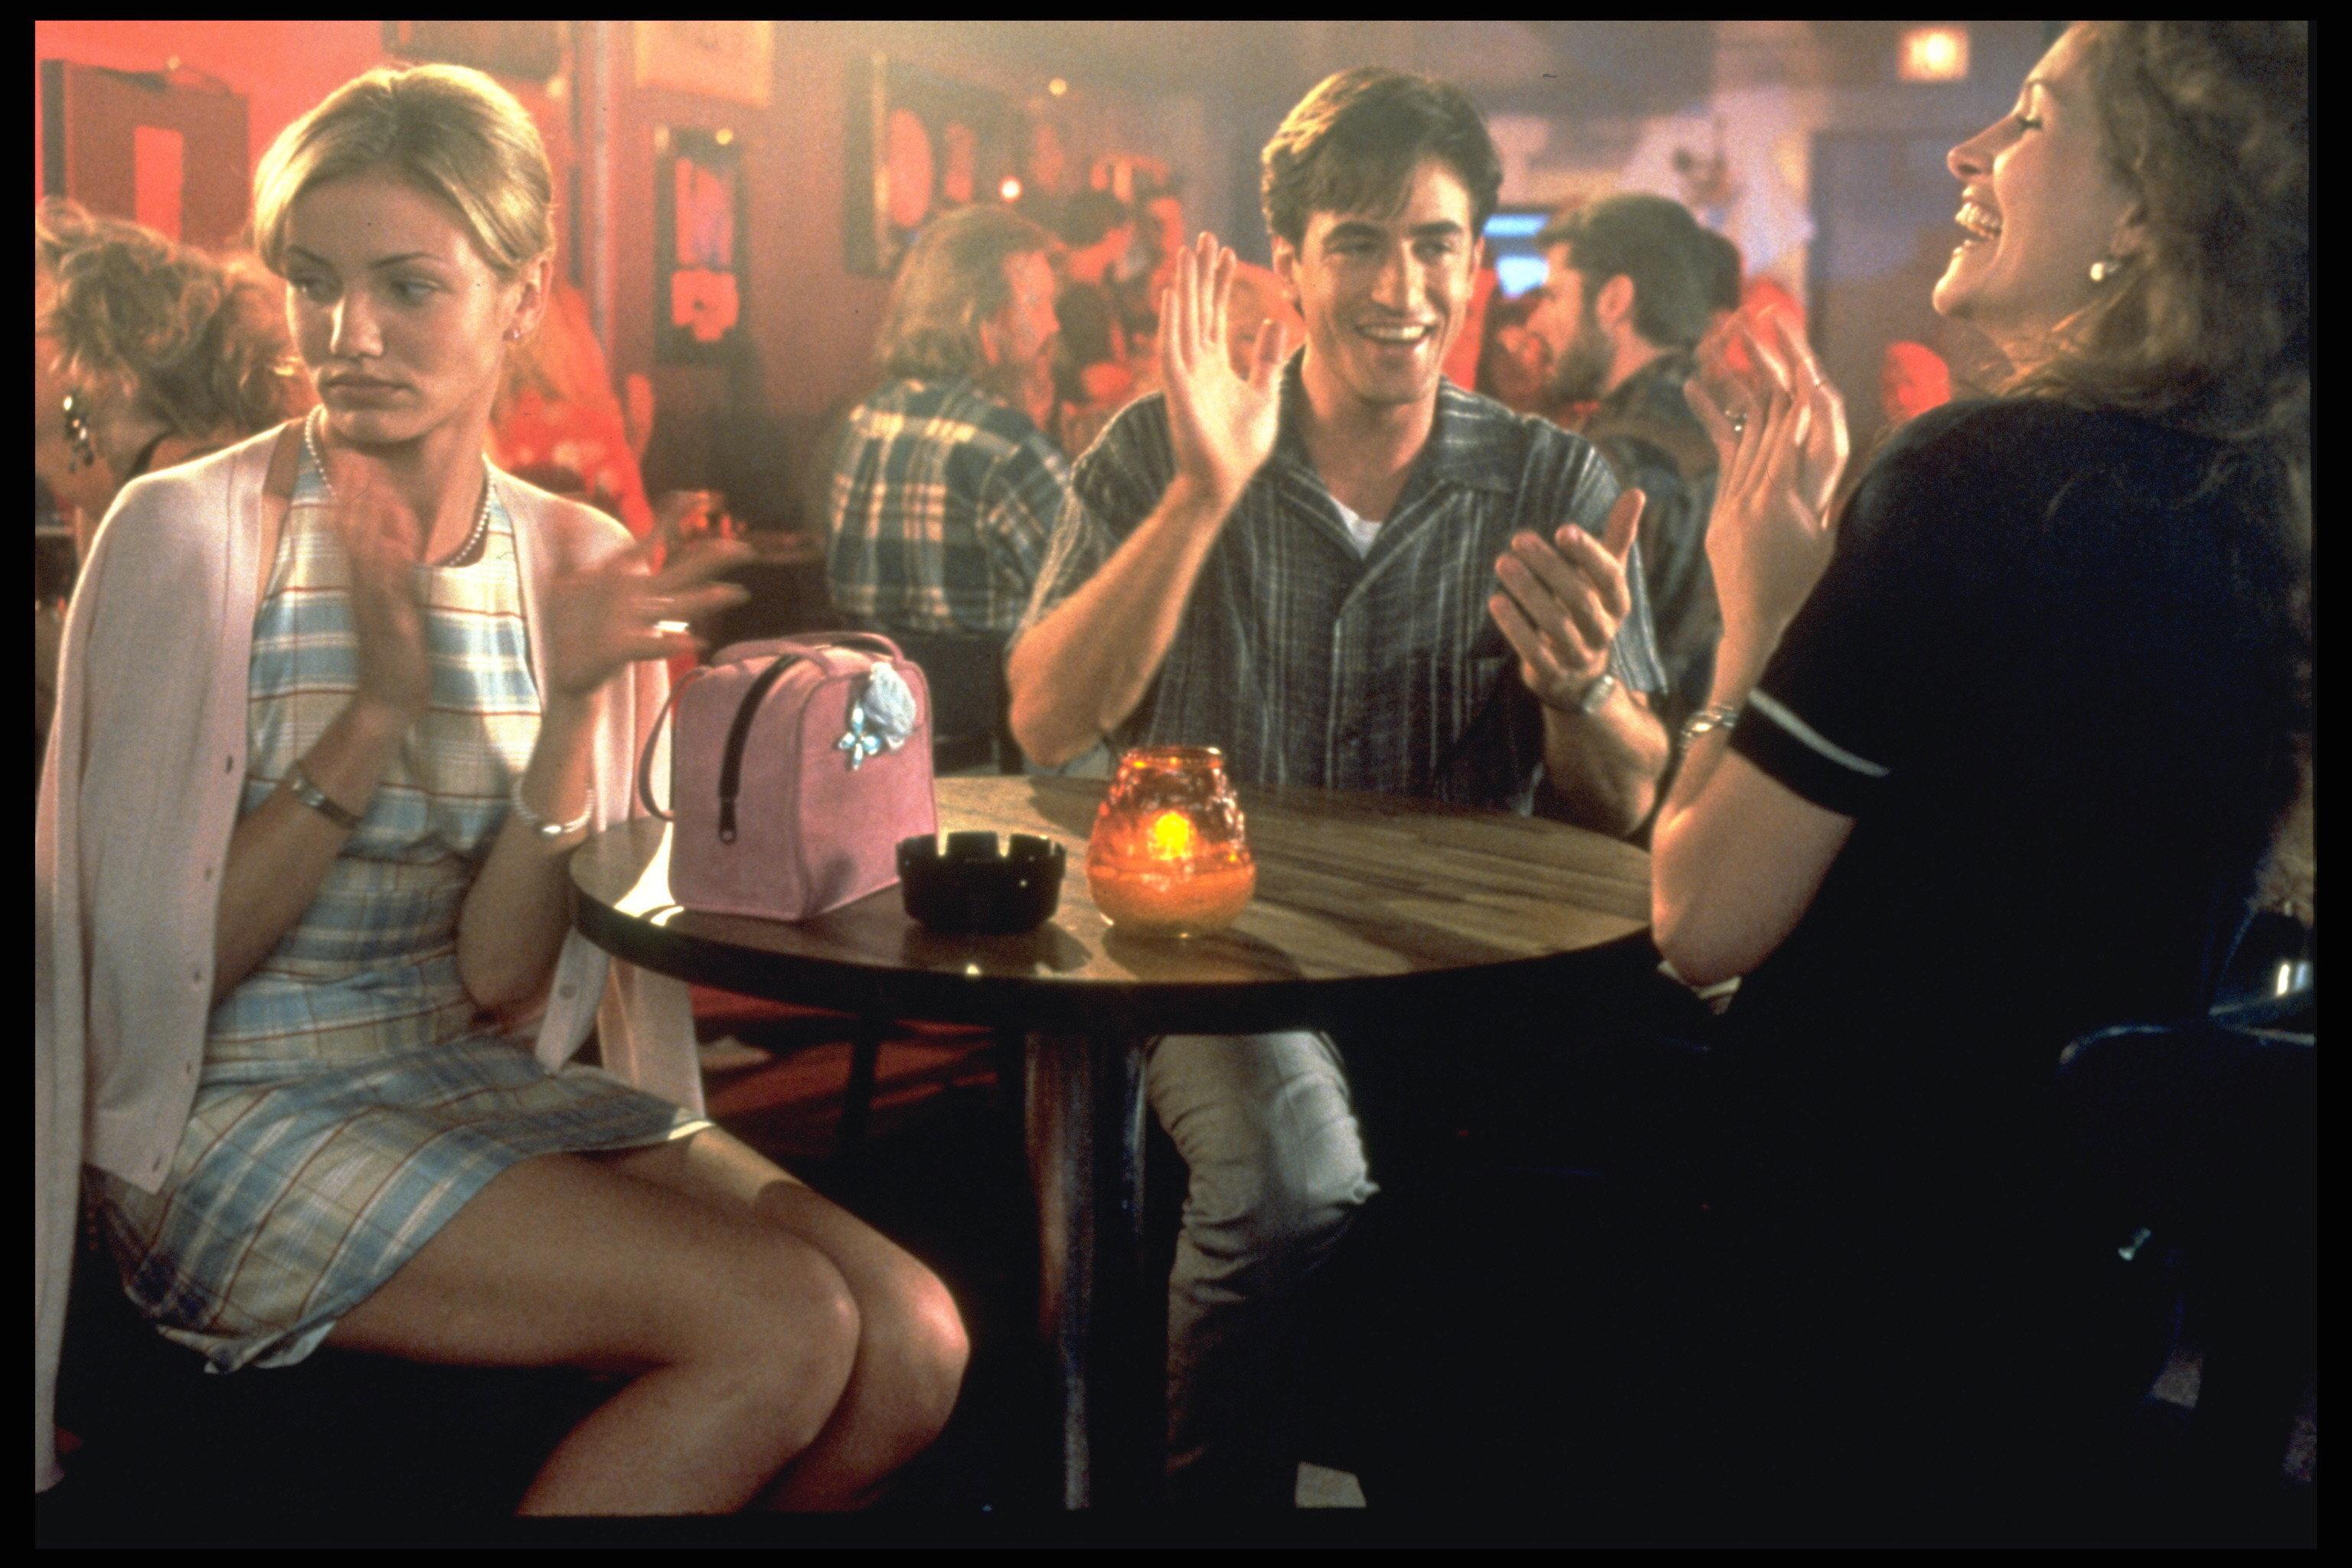 Cameron Diaz, Dermot Mulroney and Julia Roberts in a scene from